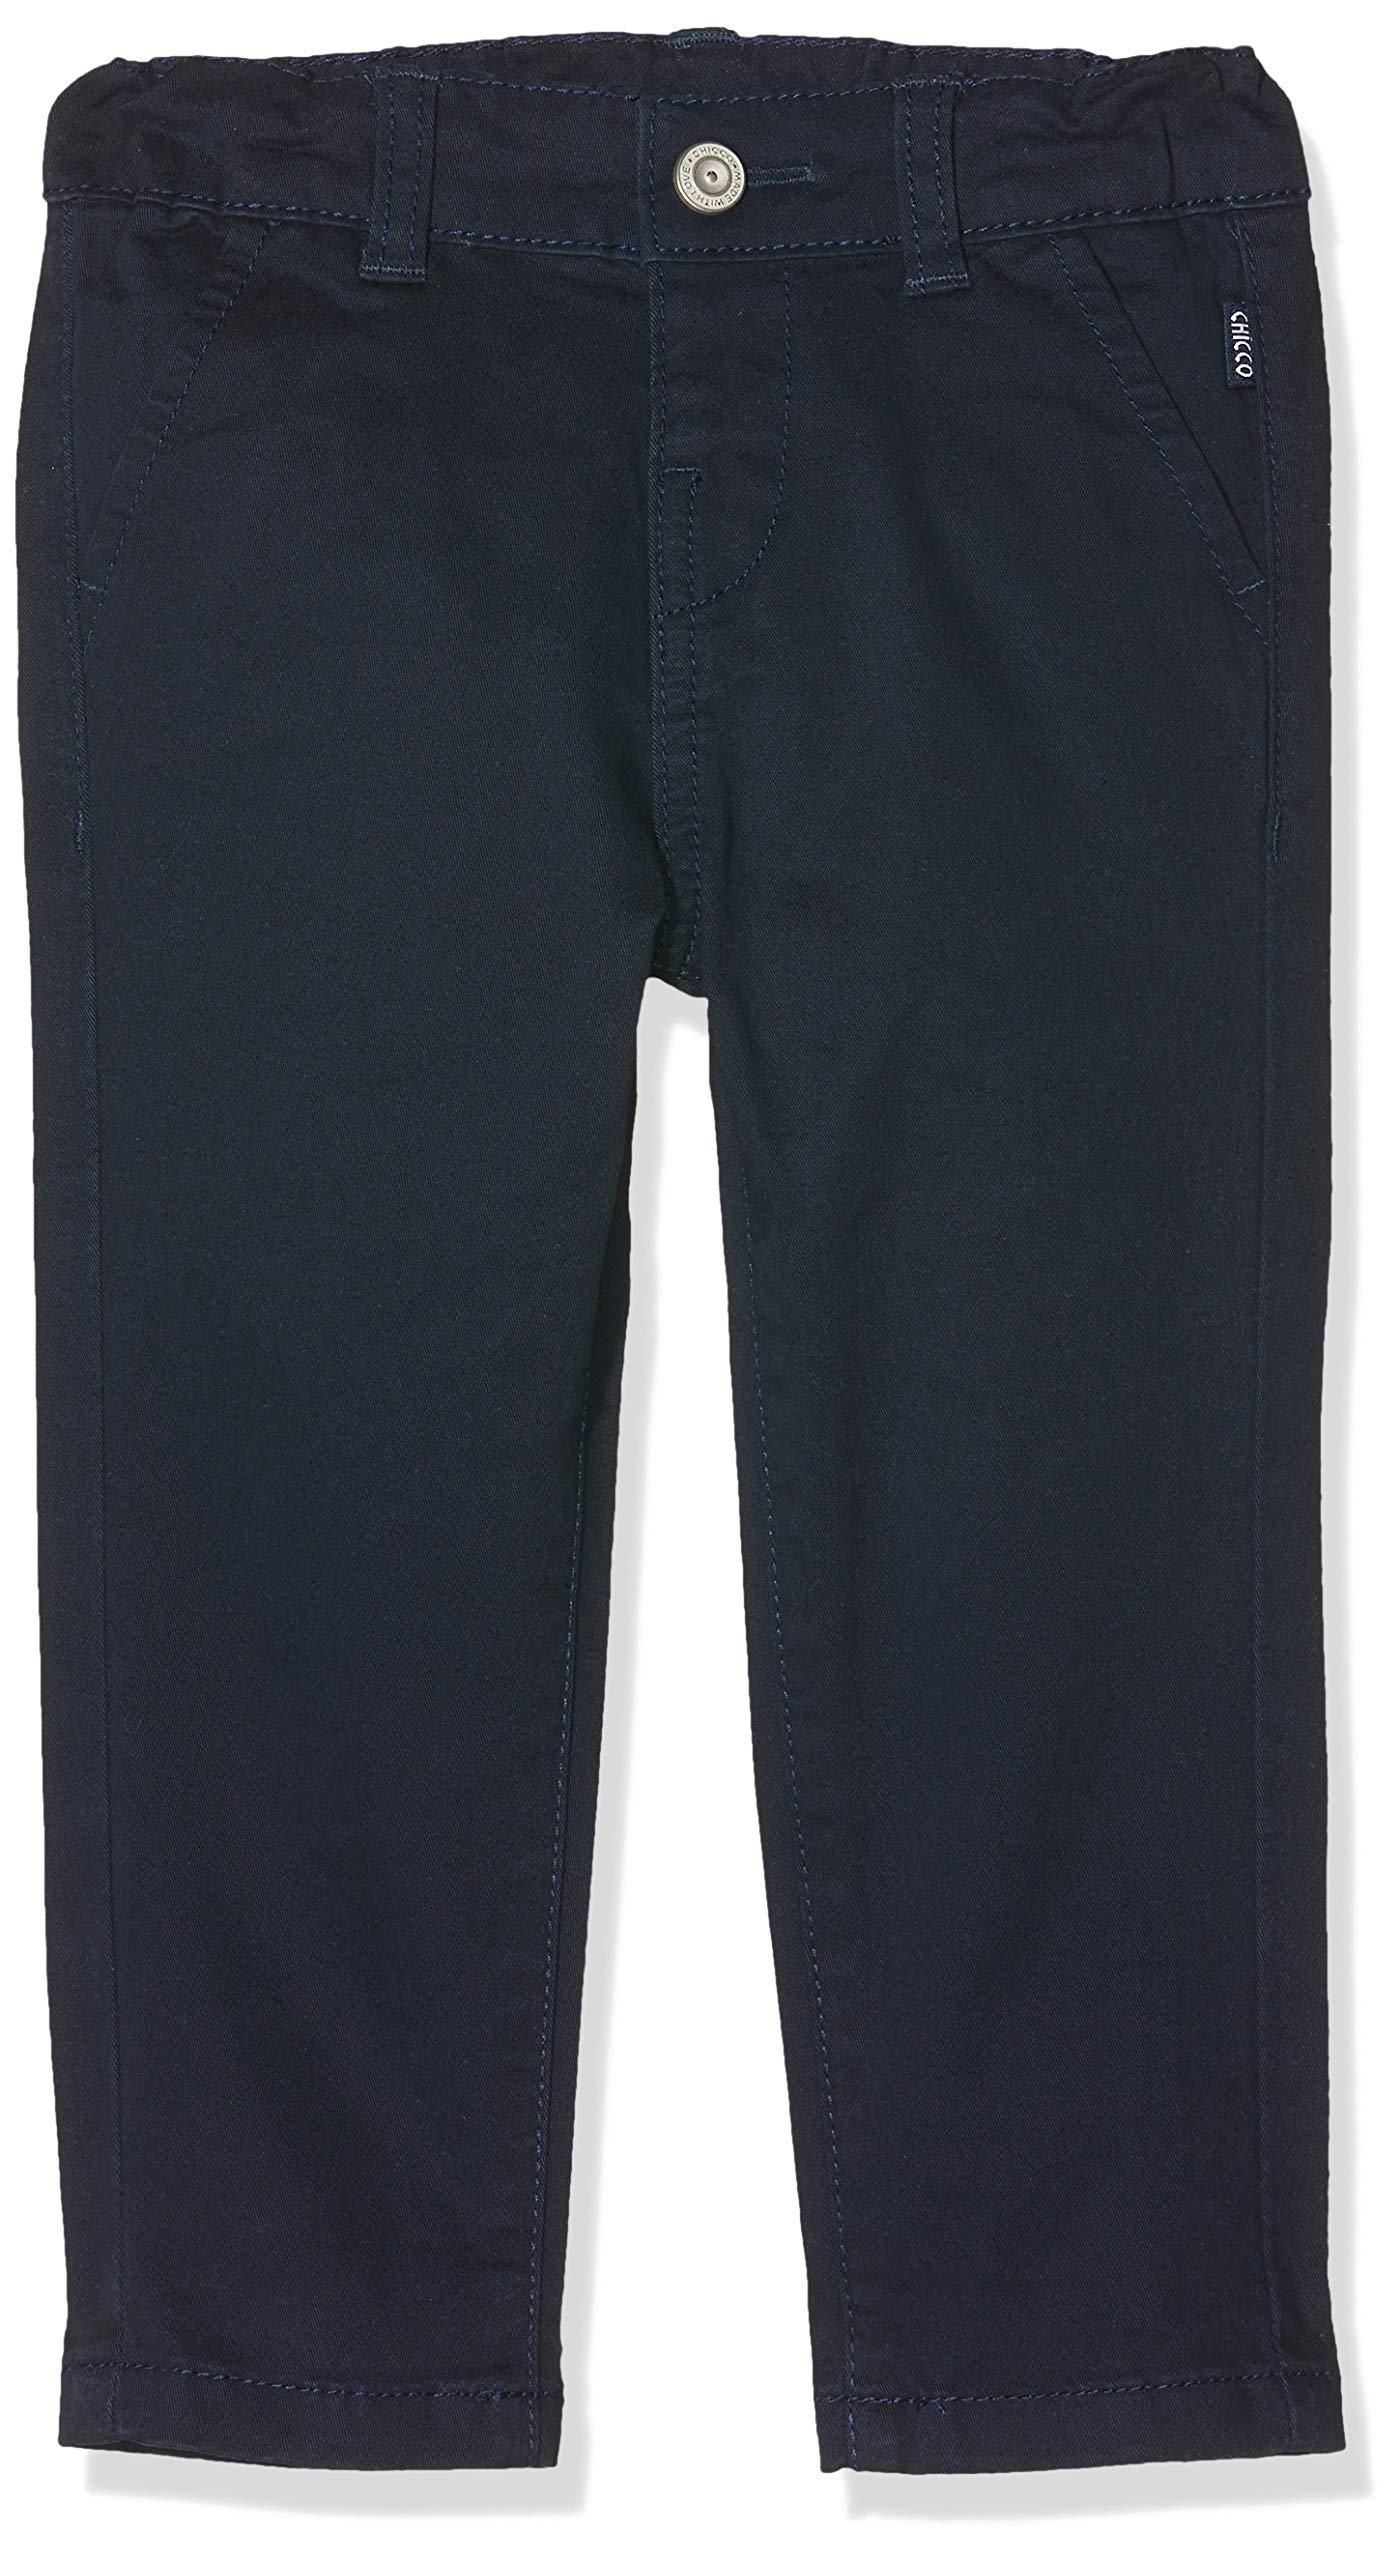 Chicco Pantaloni Lunghi Pantalones para Bebés 3